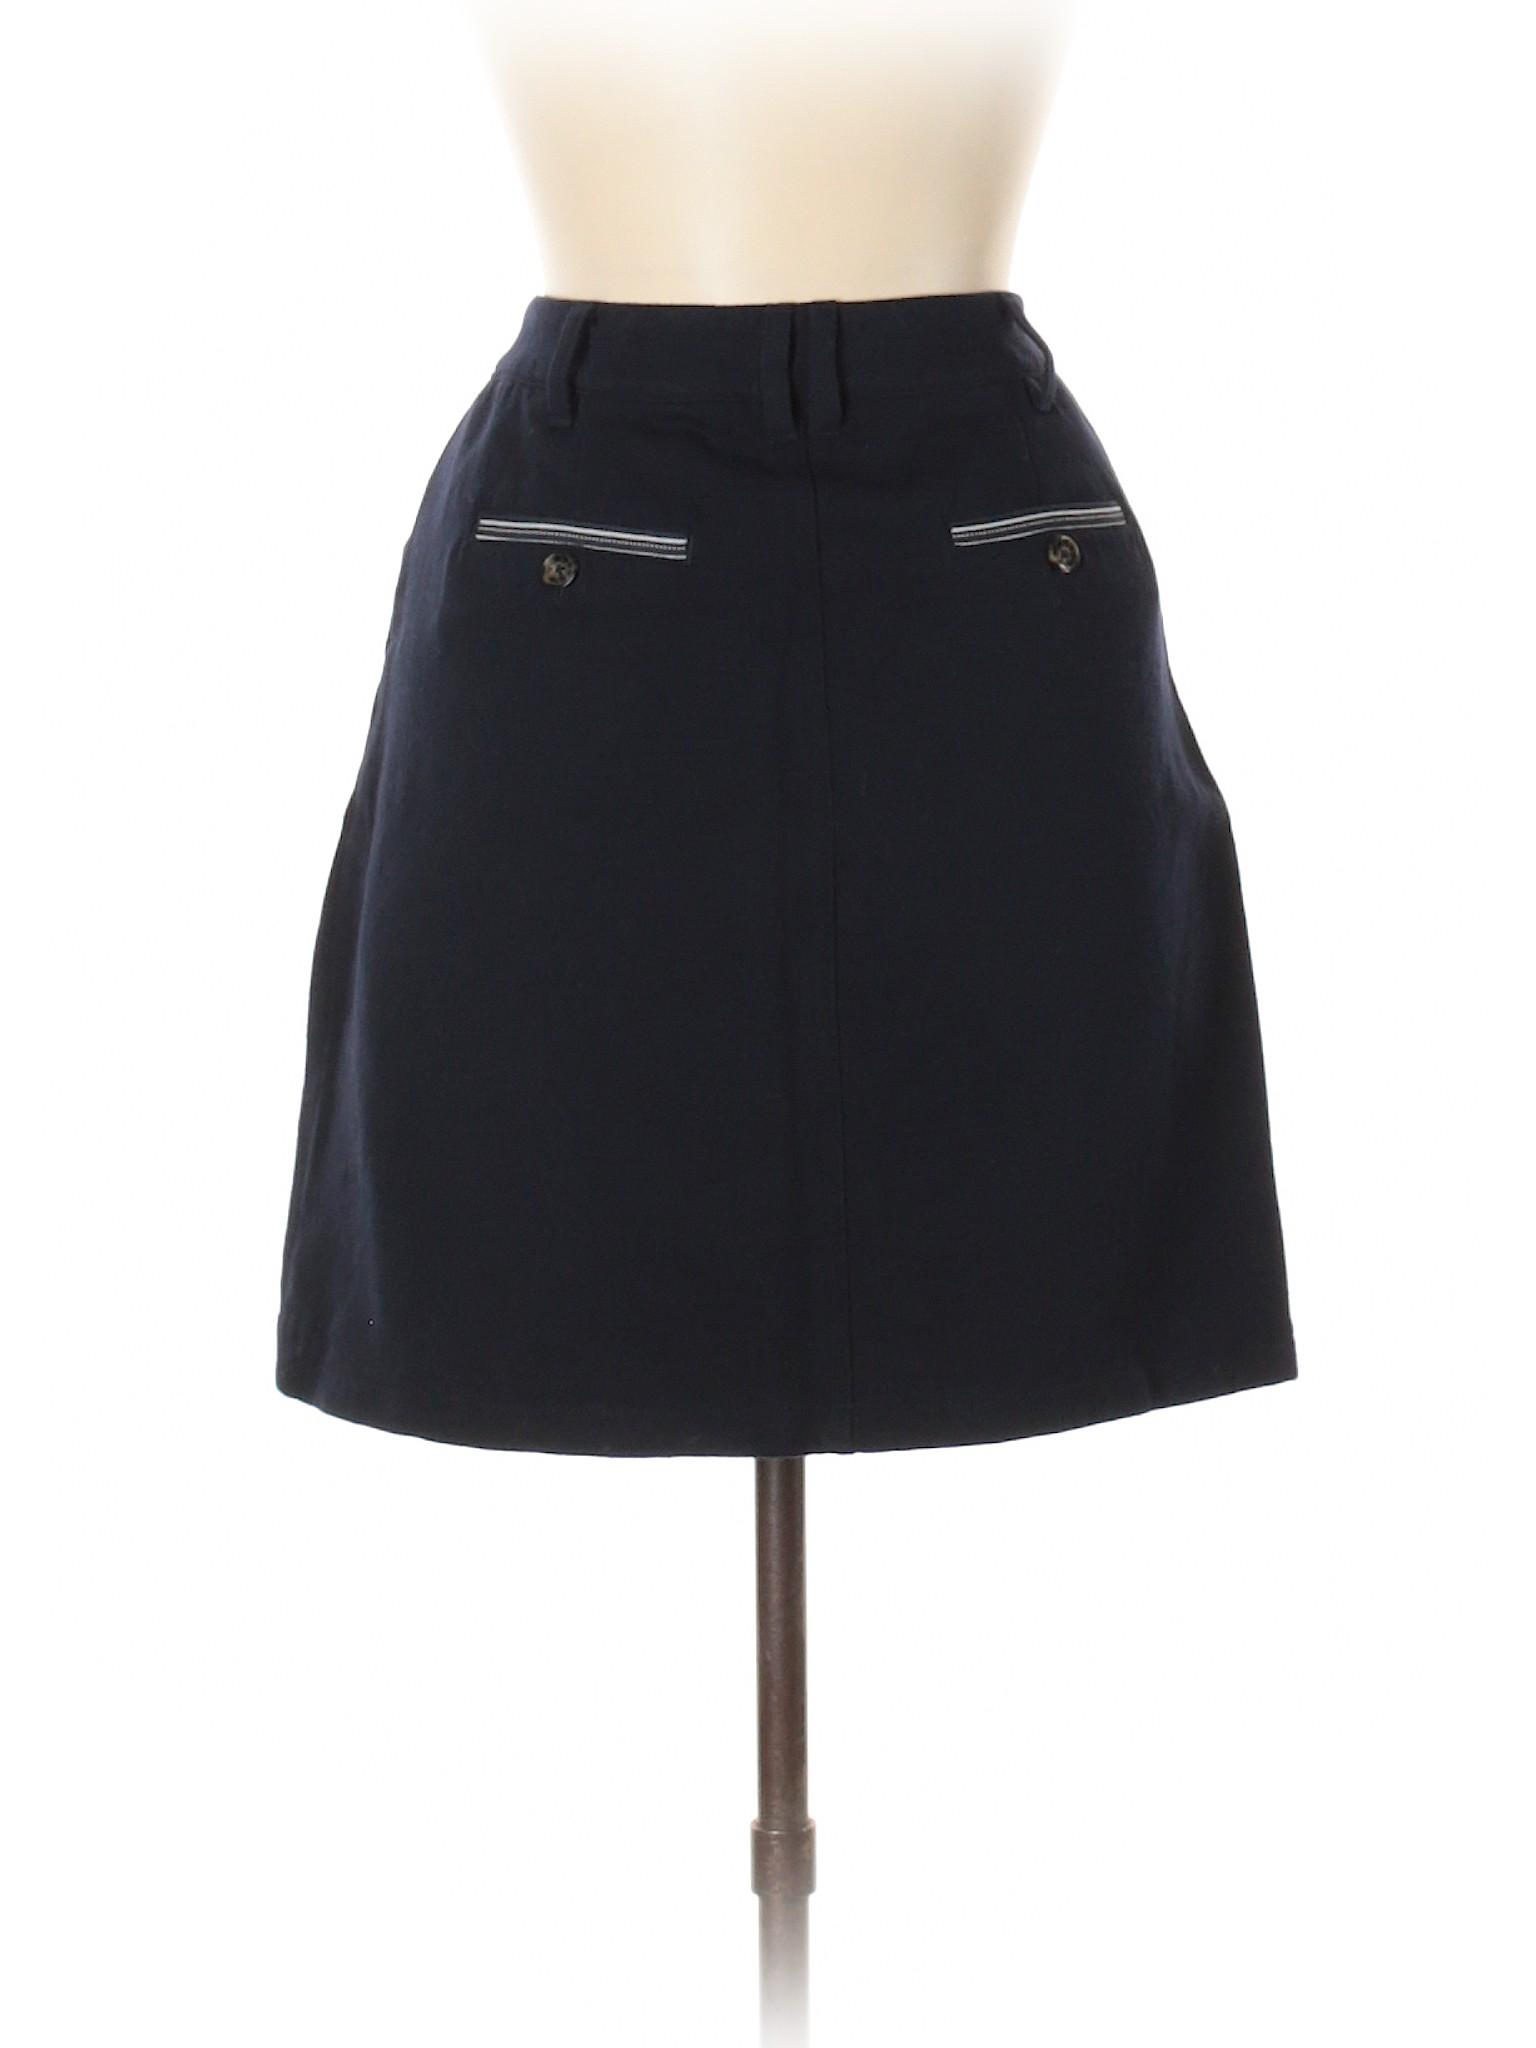 Skirt Casual Casual Casual Skirt Boutique Boutique Boutique BnYfqw